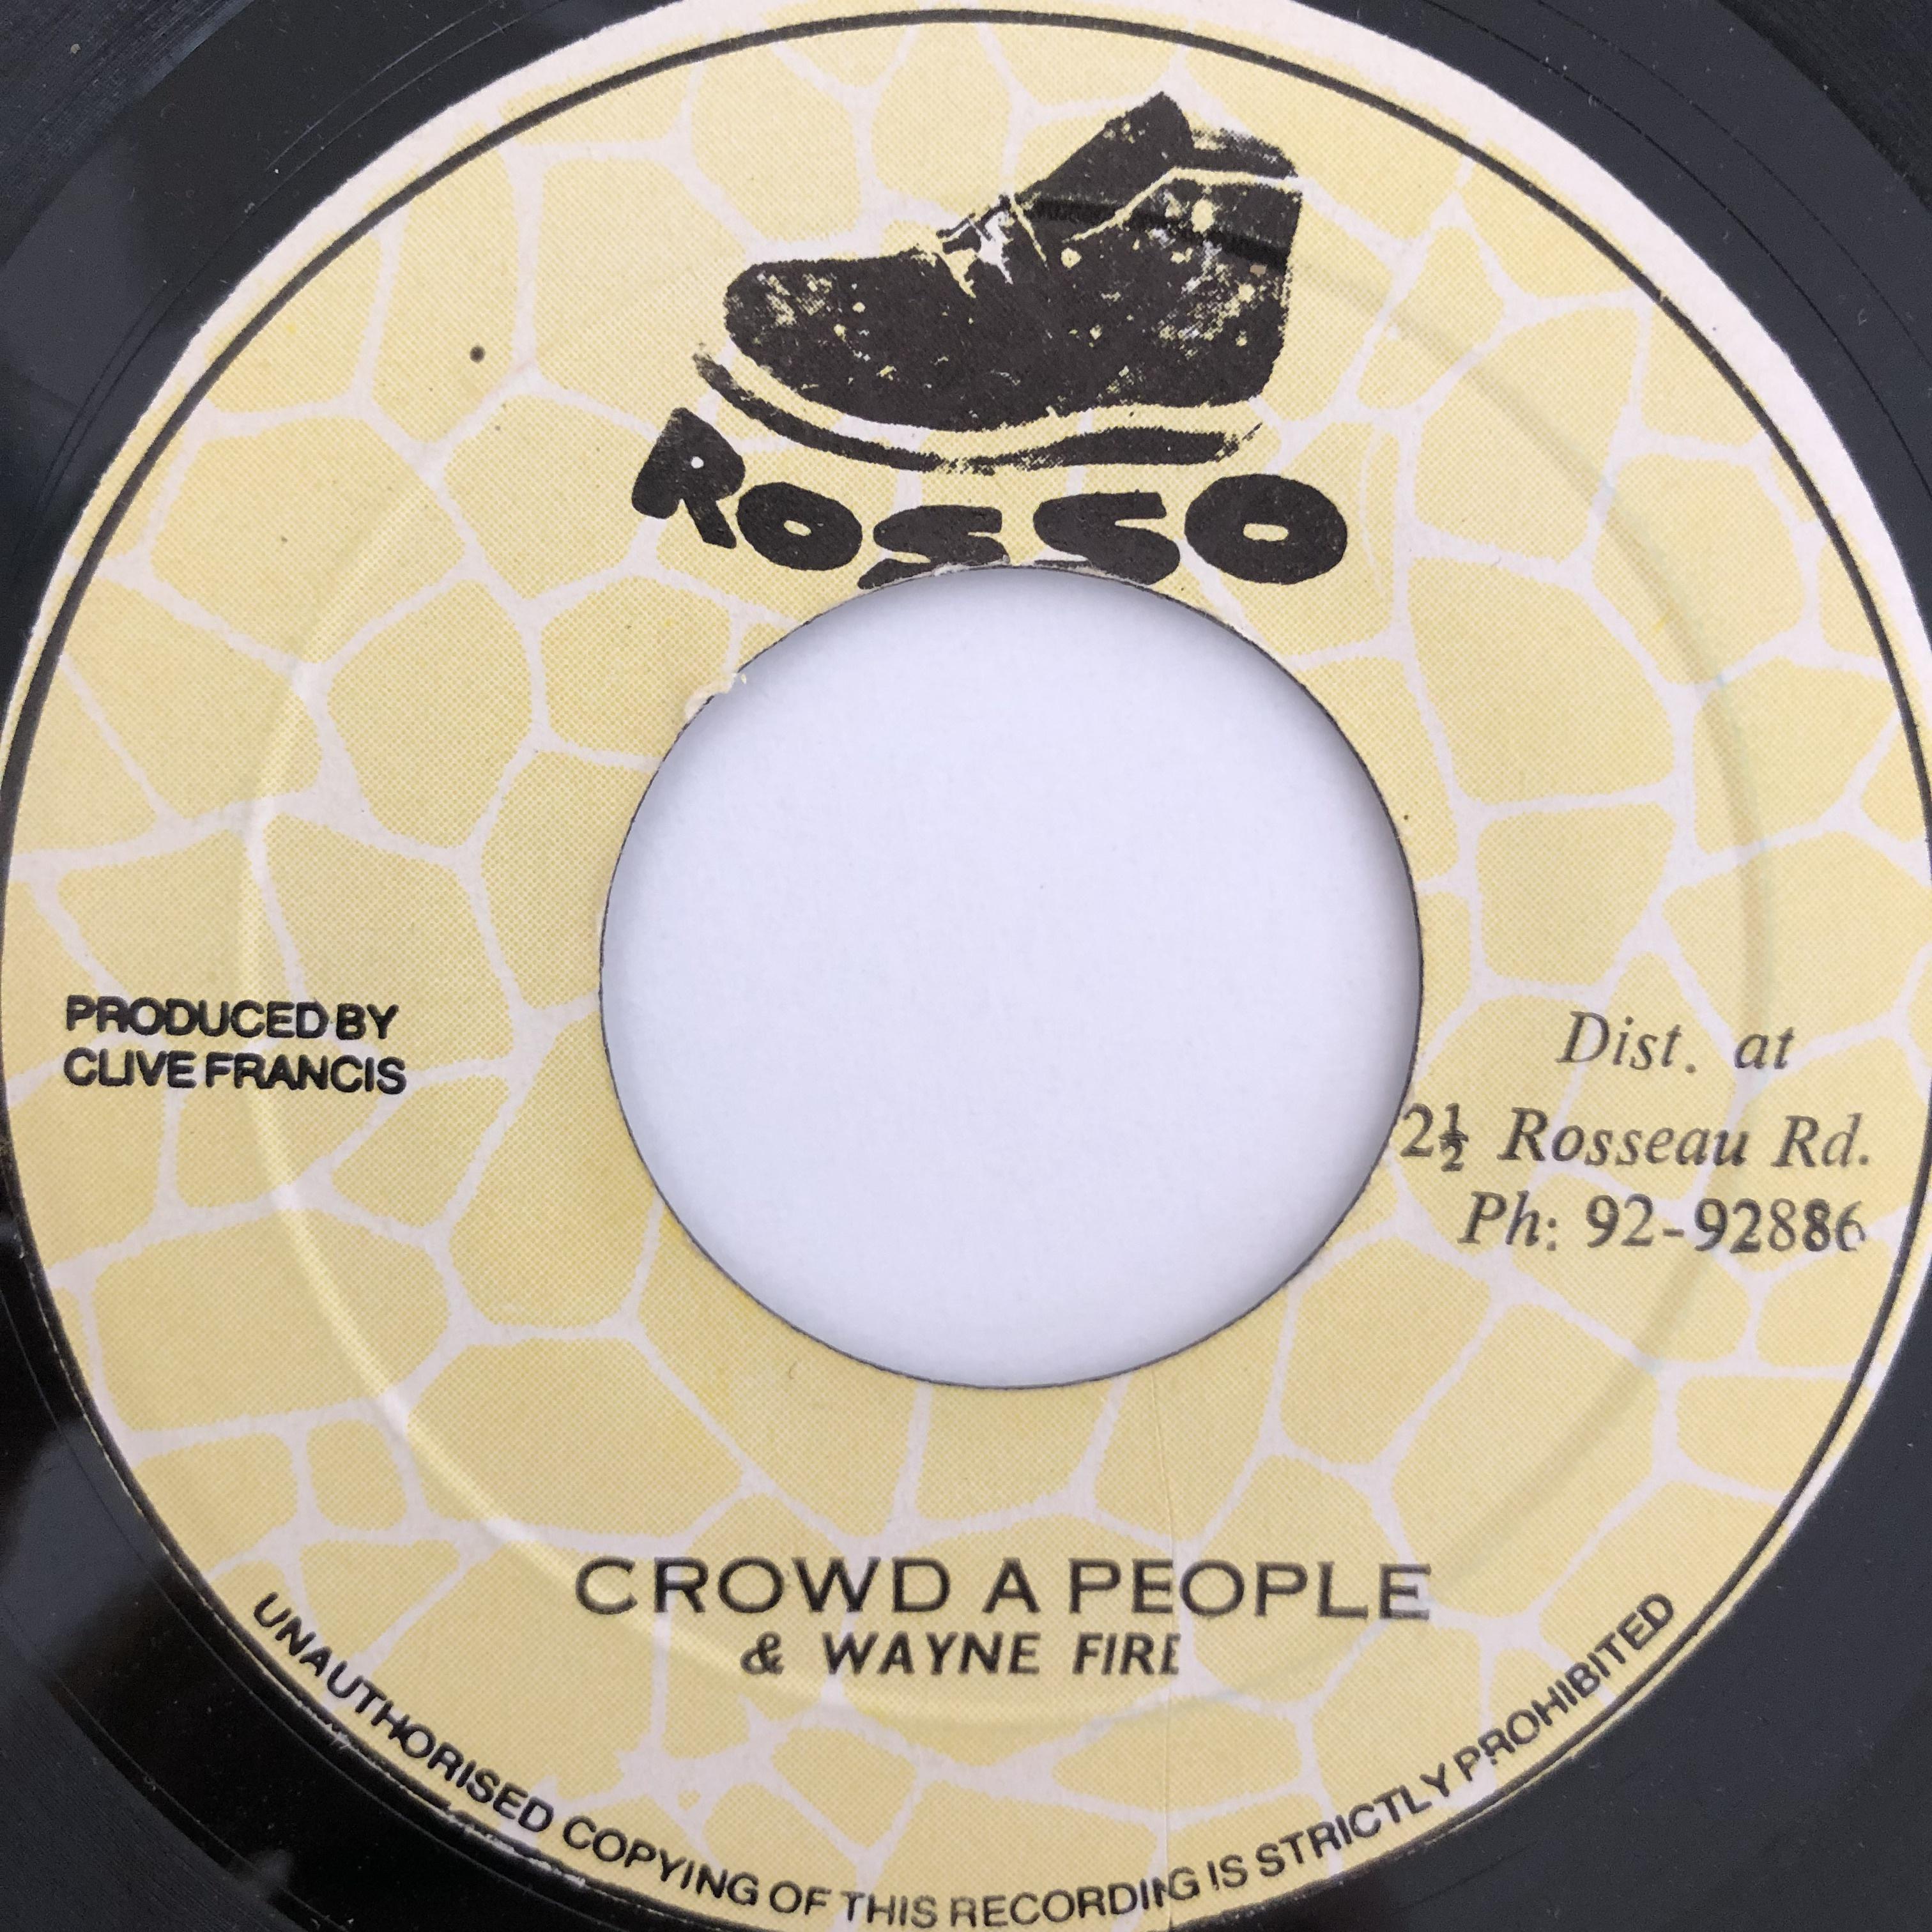 Wayne Fire(ウェインファイヤー) - Crowd A People【7-20092】